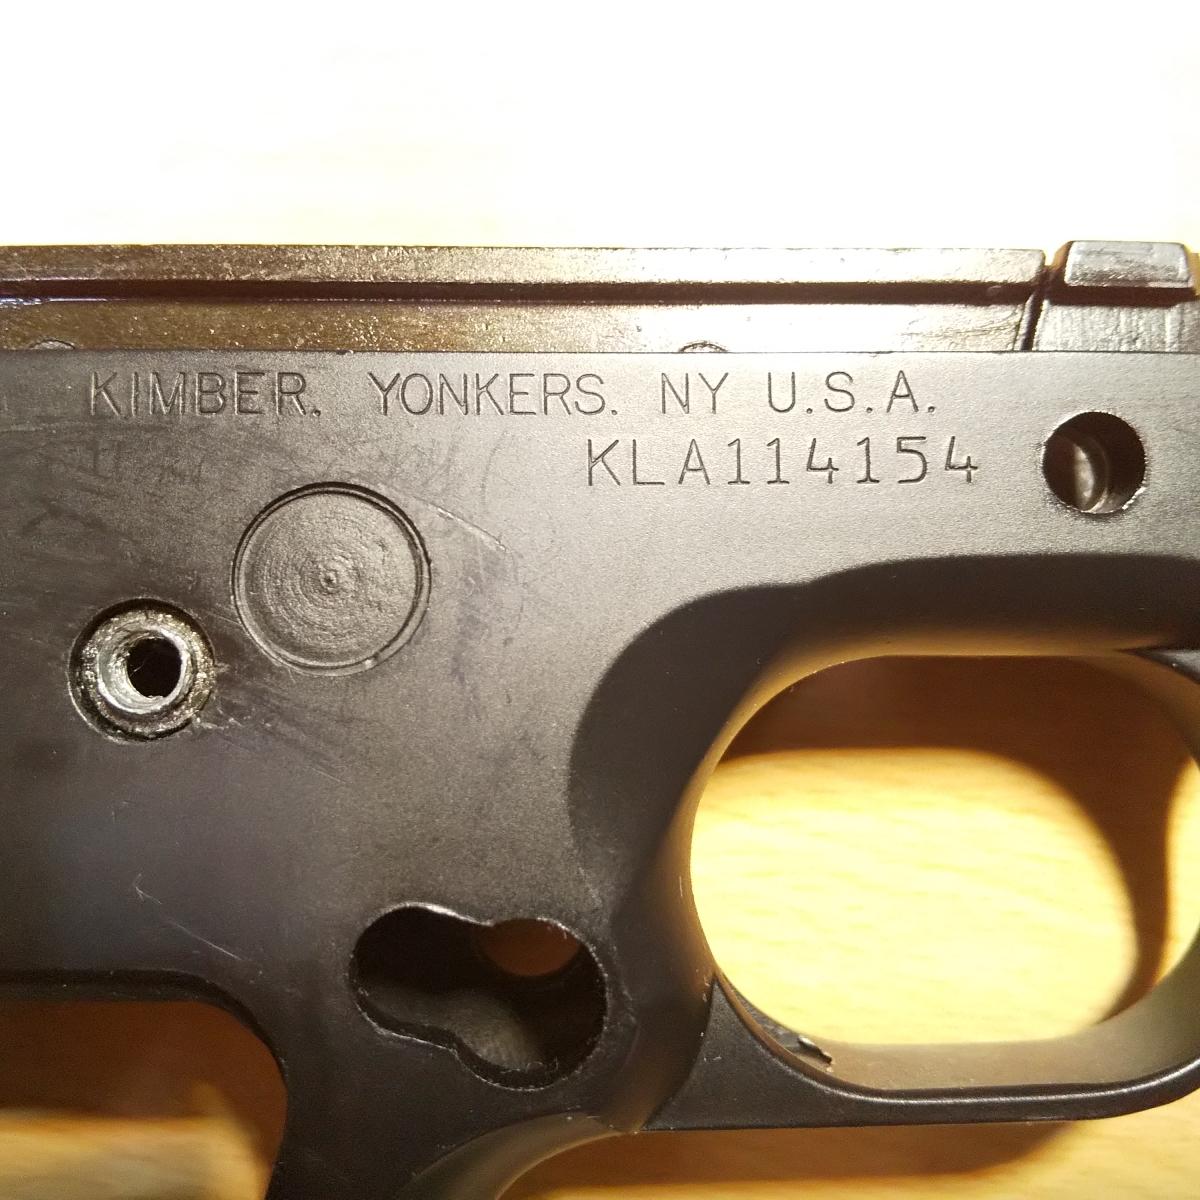 WA SCW キンバー LAPD SWAT CUSTOM II Ver.3 HW フレーム アッセンブリー 一式/1911 ガバメント MEU コルト ウイルソン Prime_画像3